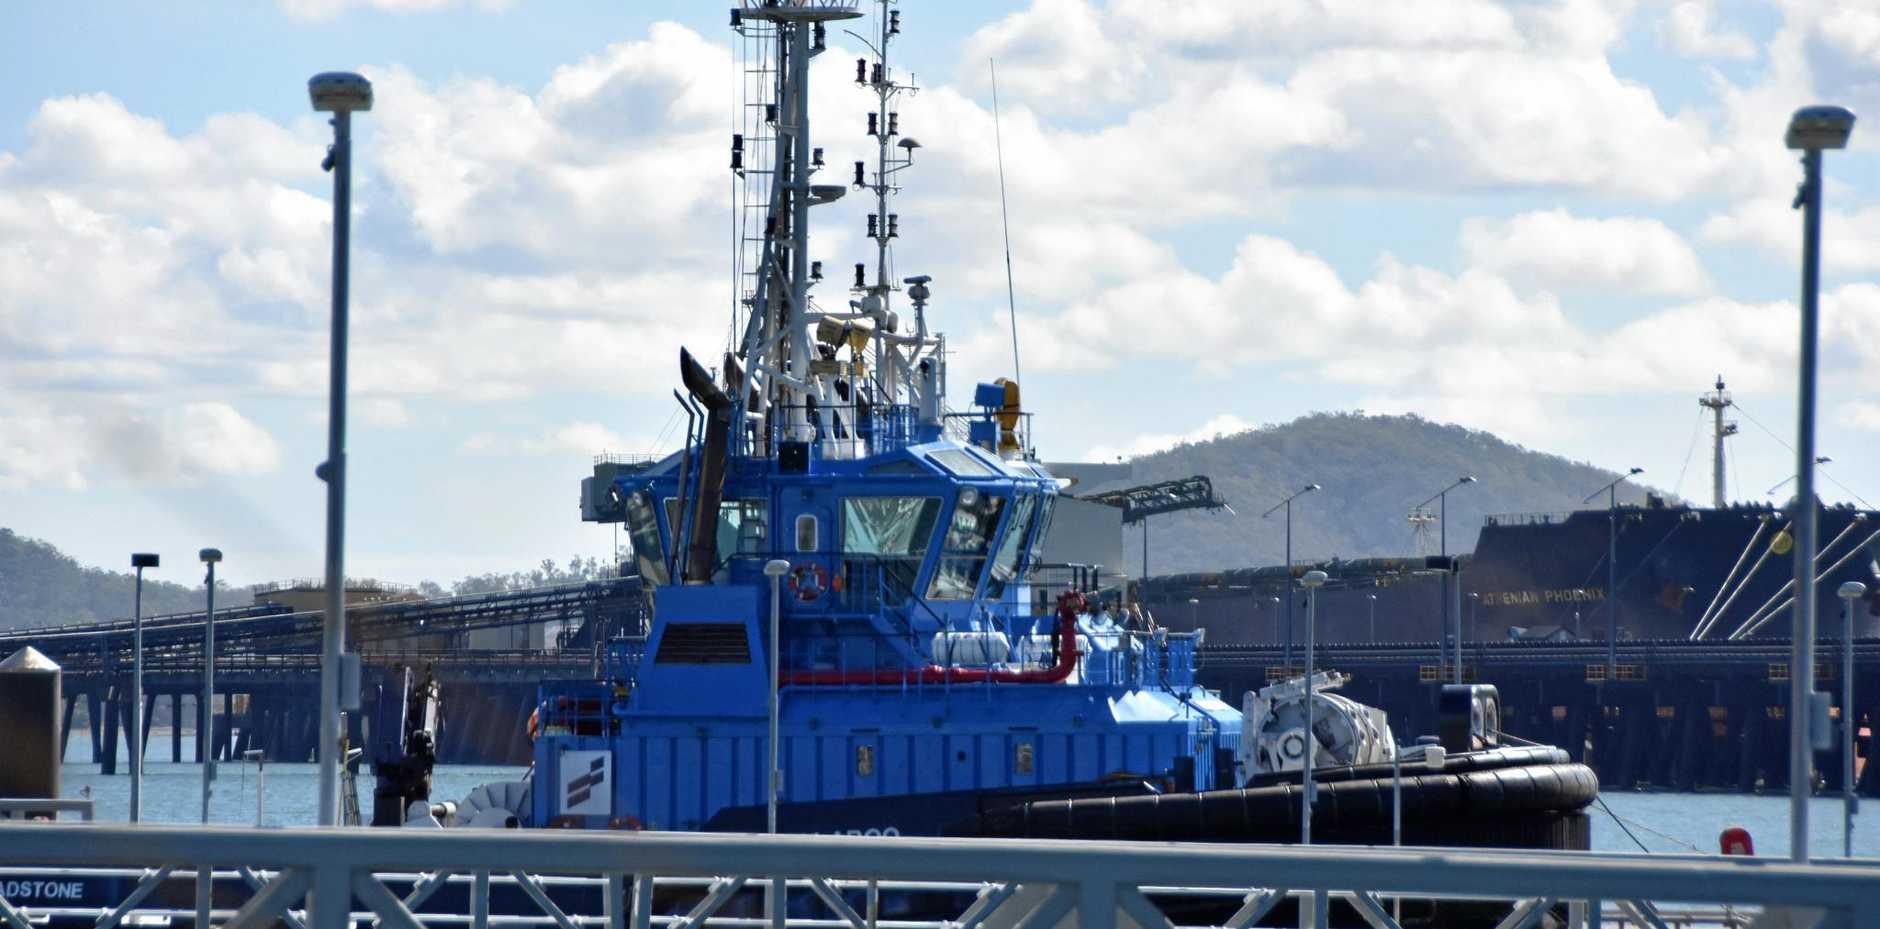 THE Tug ship Kullaro in the marina.